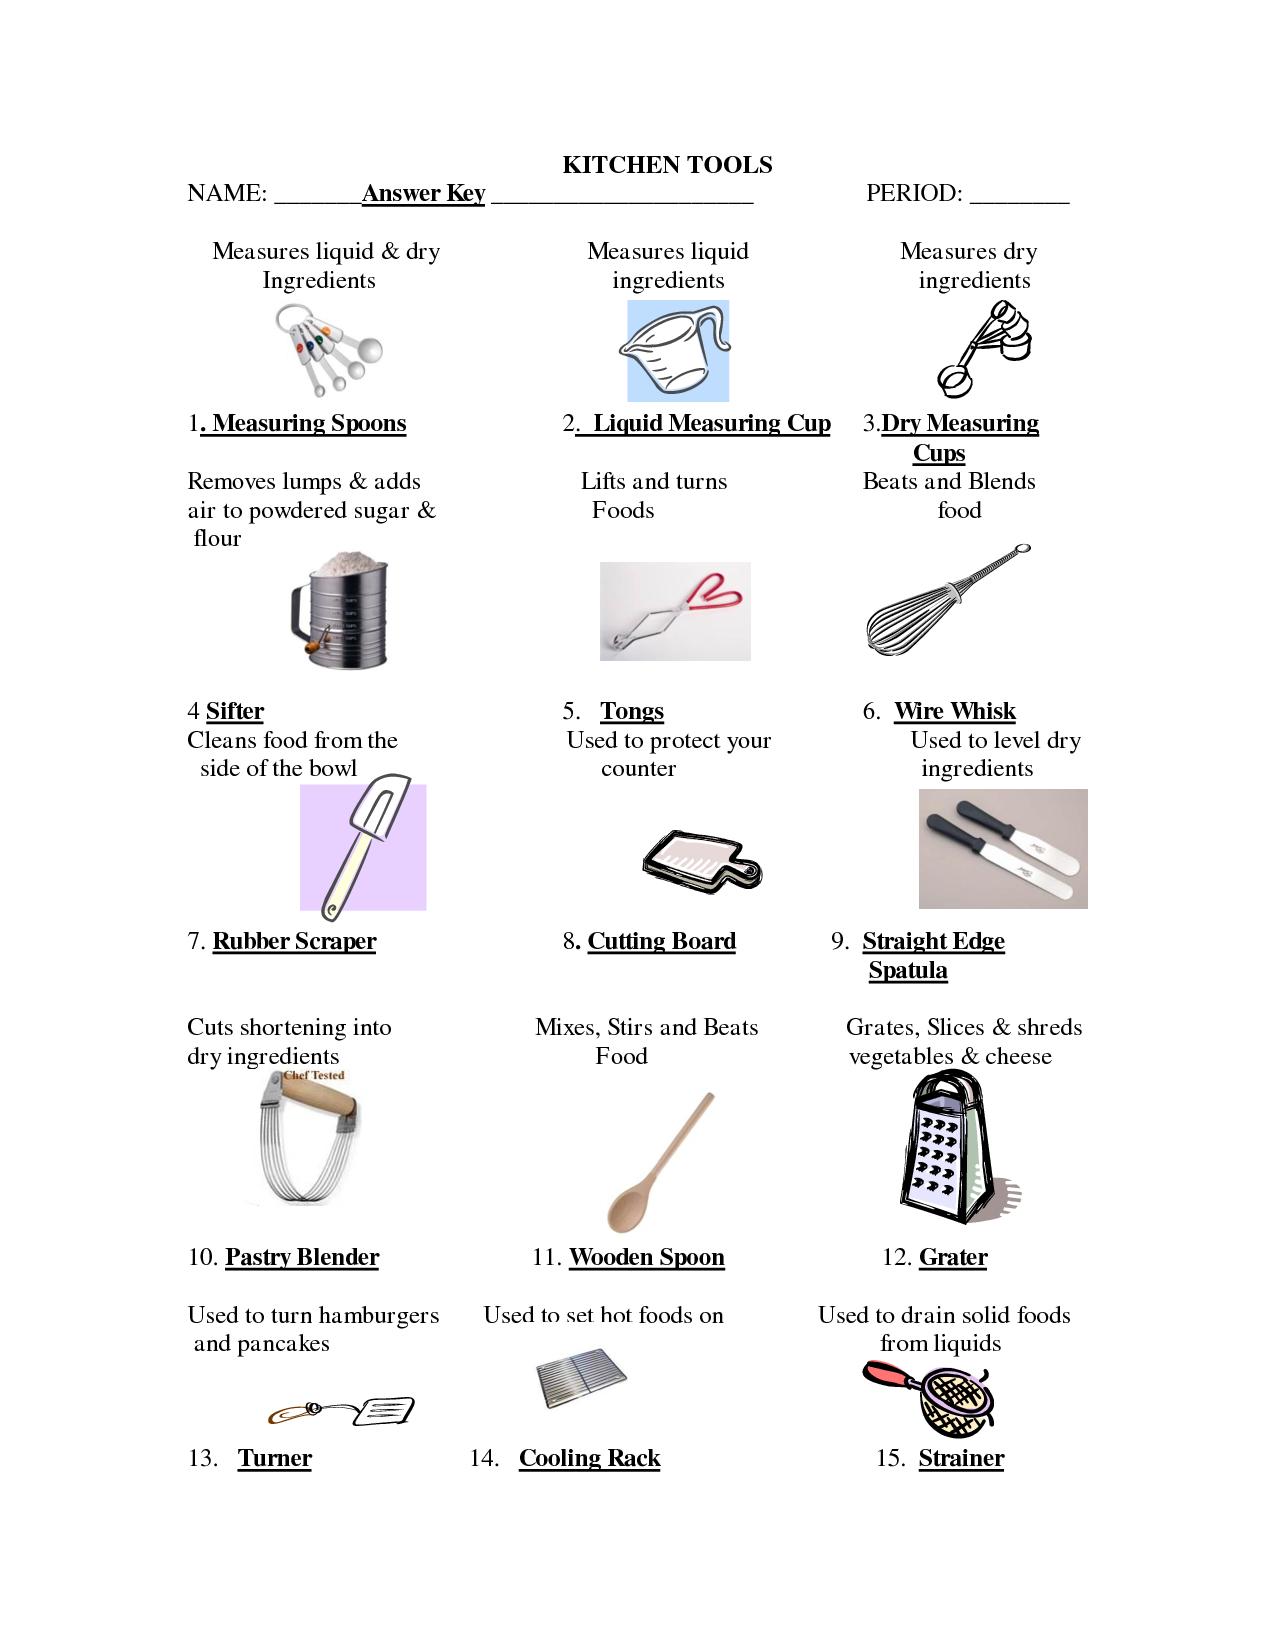 Kitchen Tools Names 2014 - Best Kitchen Design Tools | Doodles ...